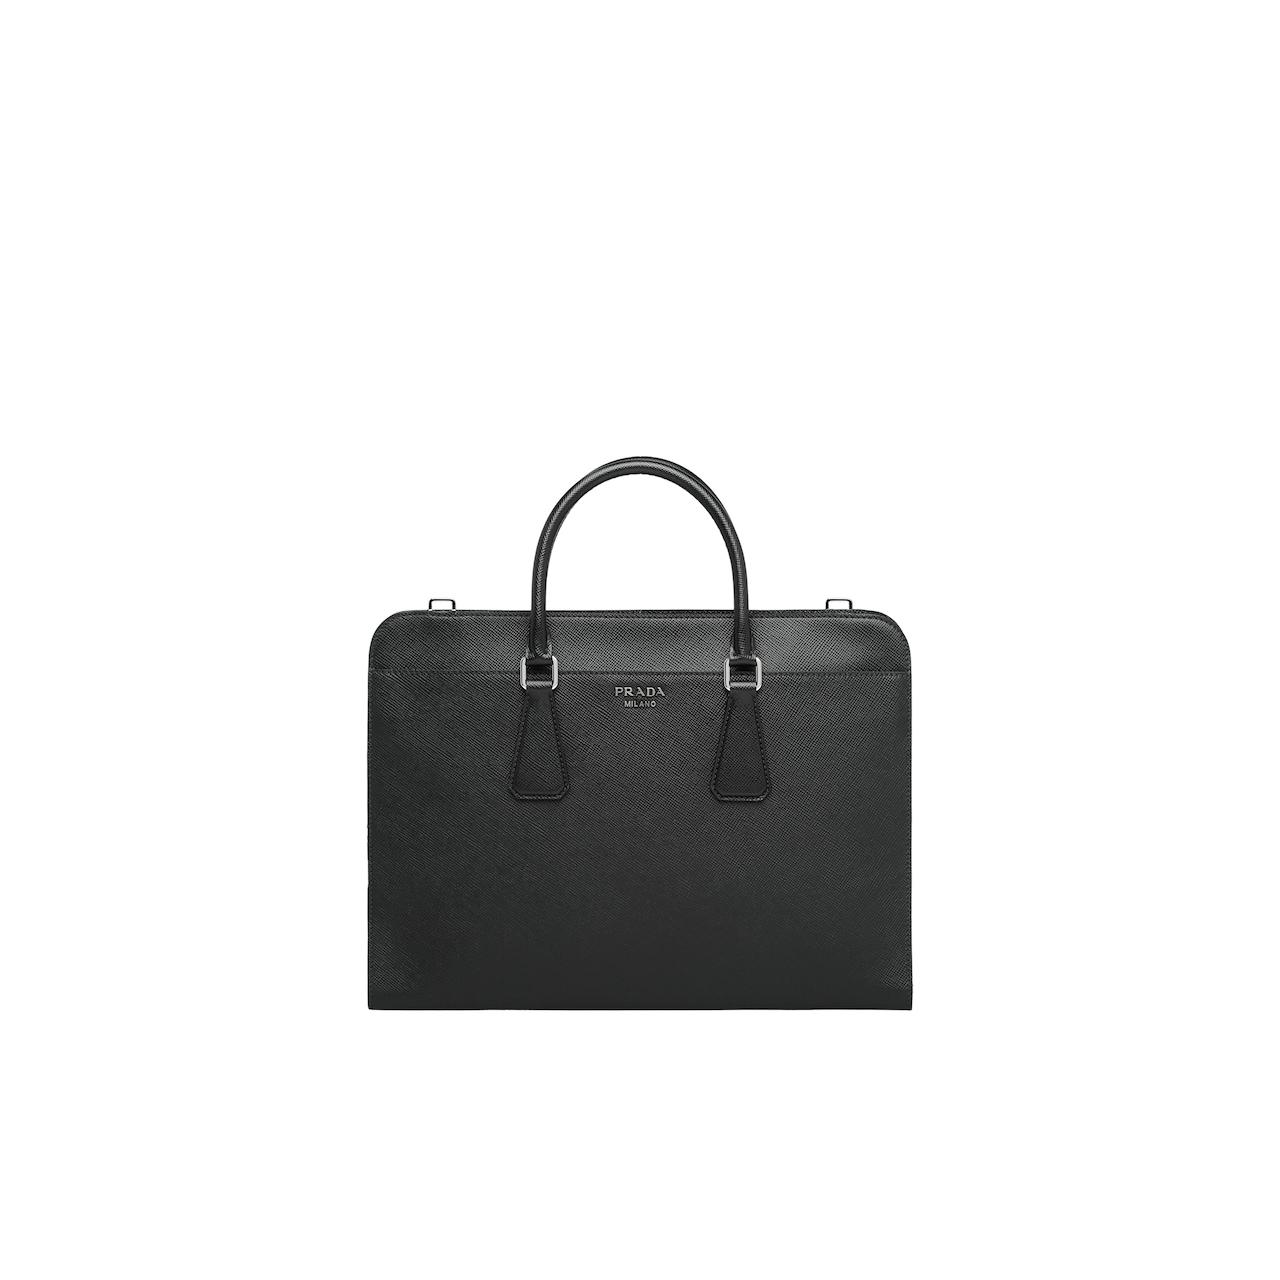 Prada Saffiano leather briefcase 1